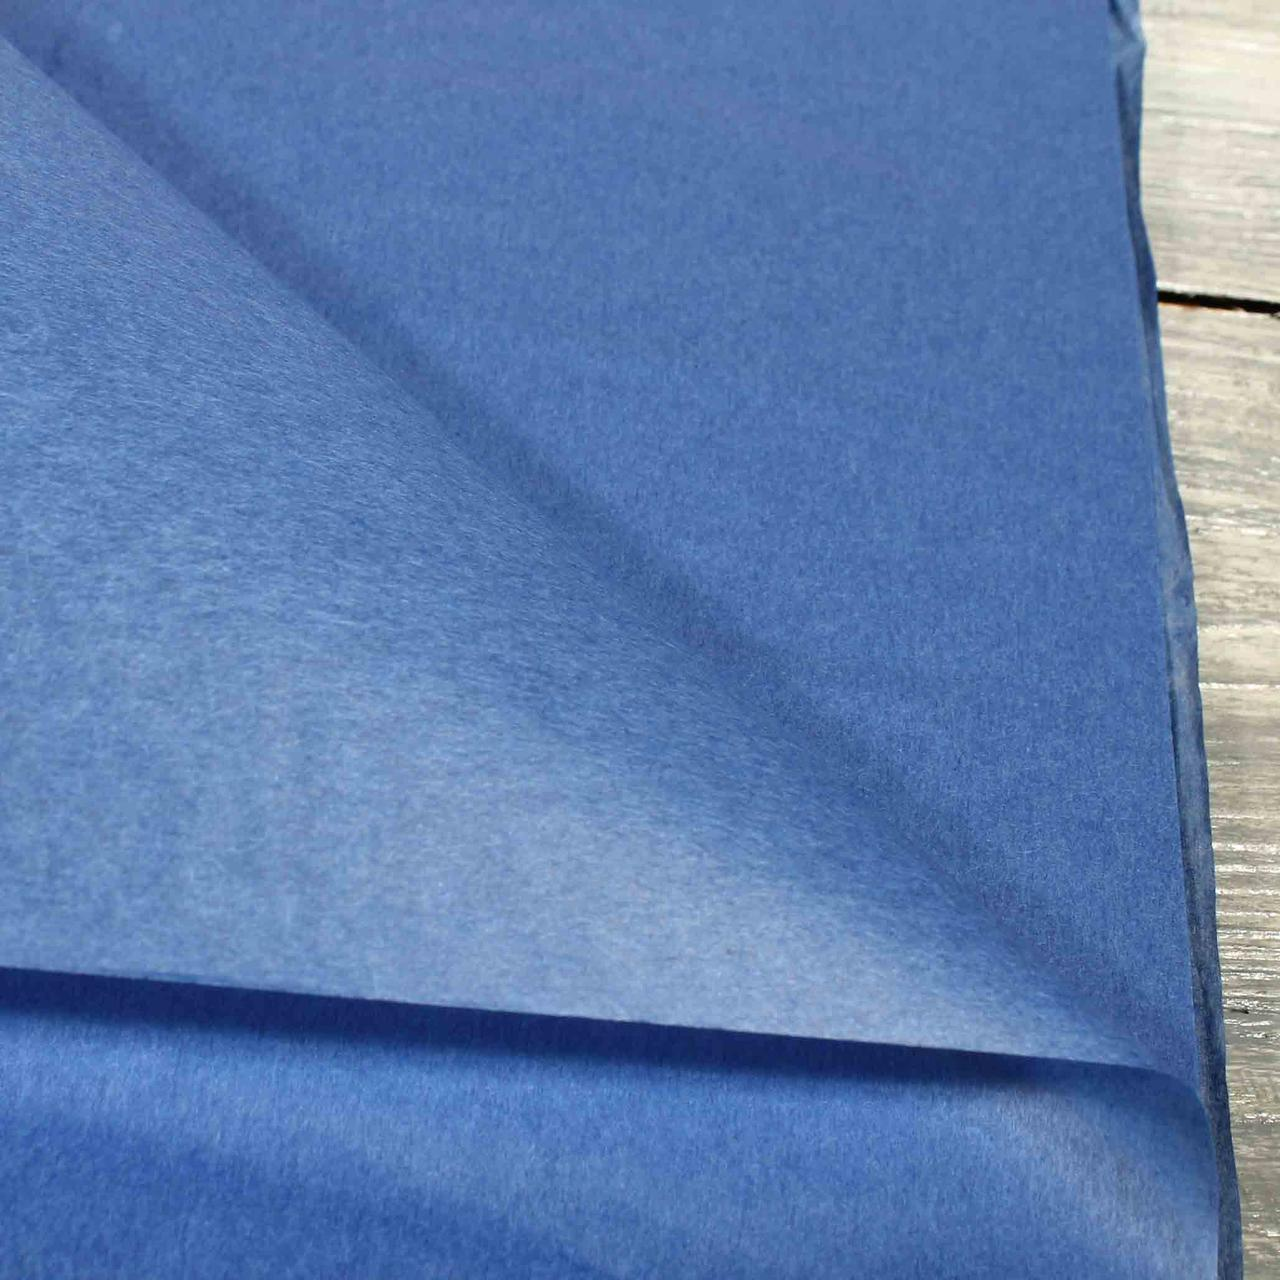 Тишью №T-011 (50*65 см, 100 листов)